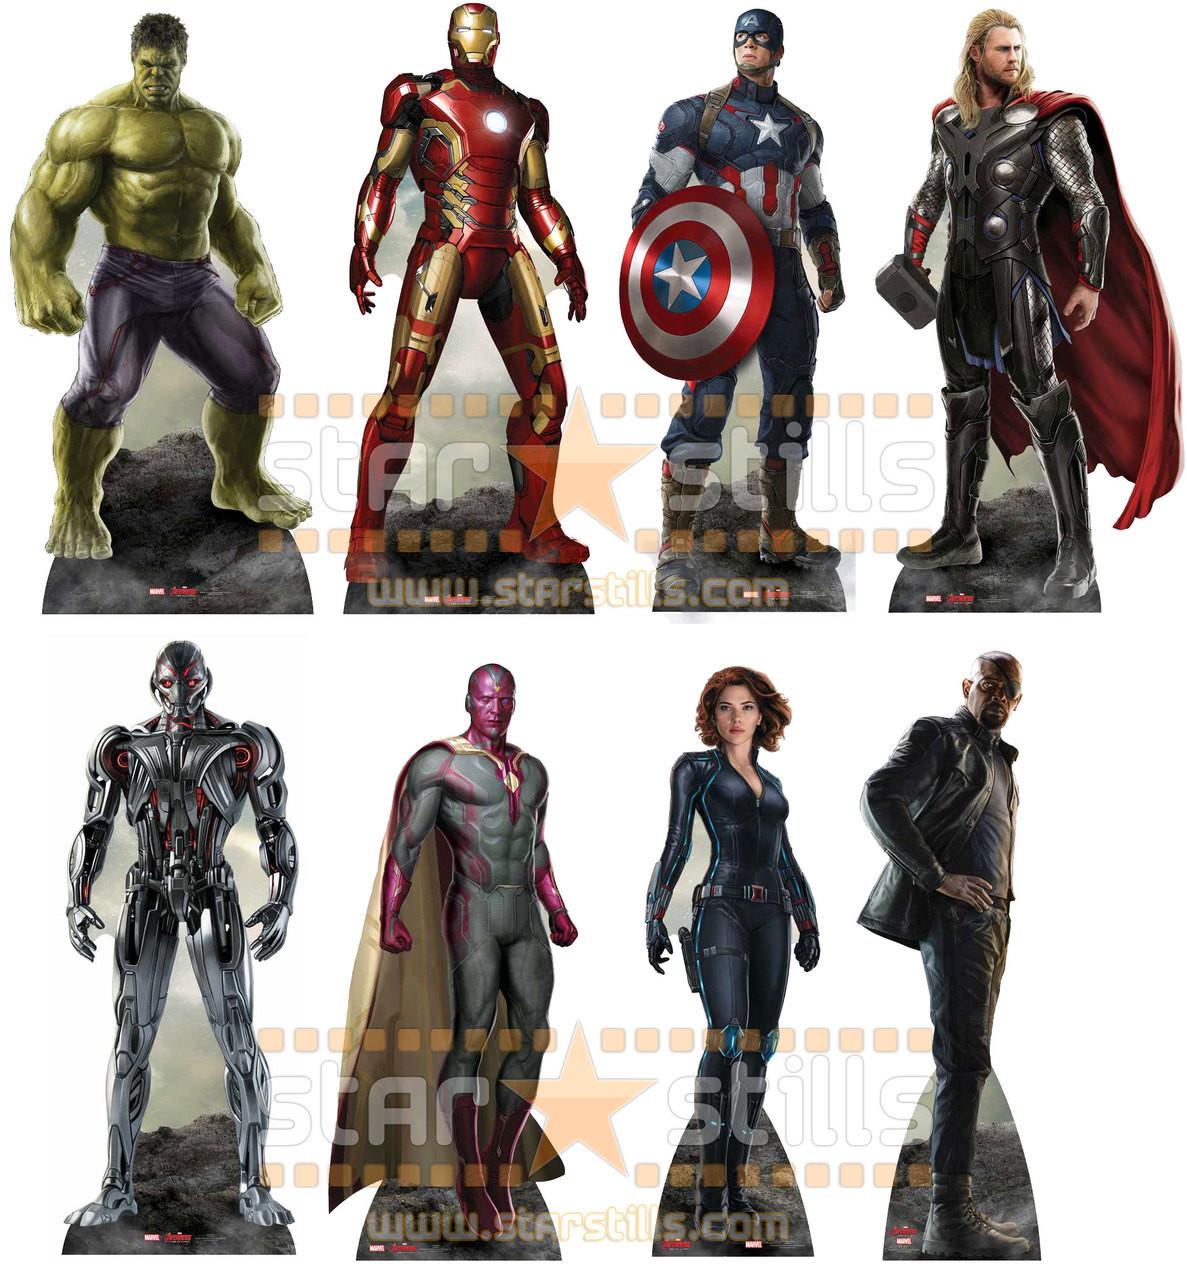 Avengers Age of Ultron Marvel Set of 8 Lifesize Cardboard Cutouts ...